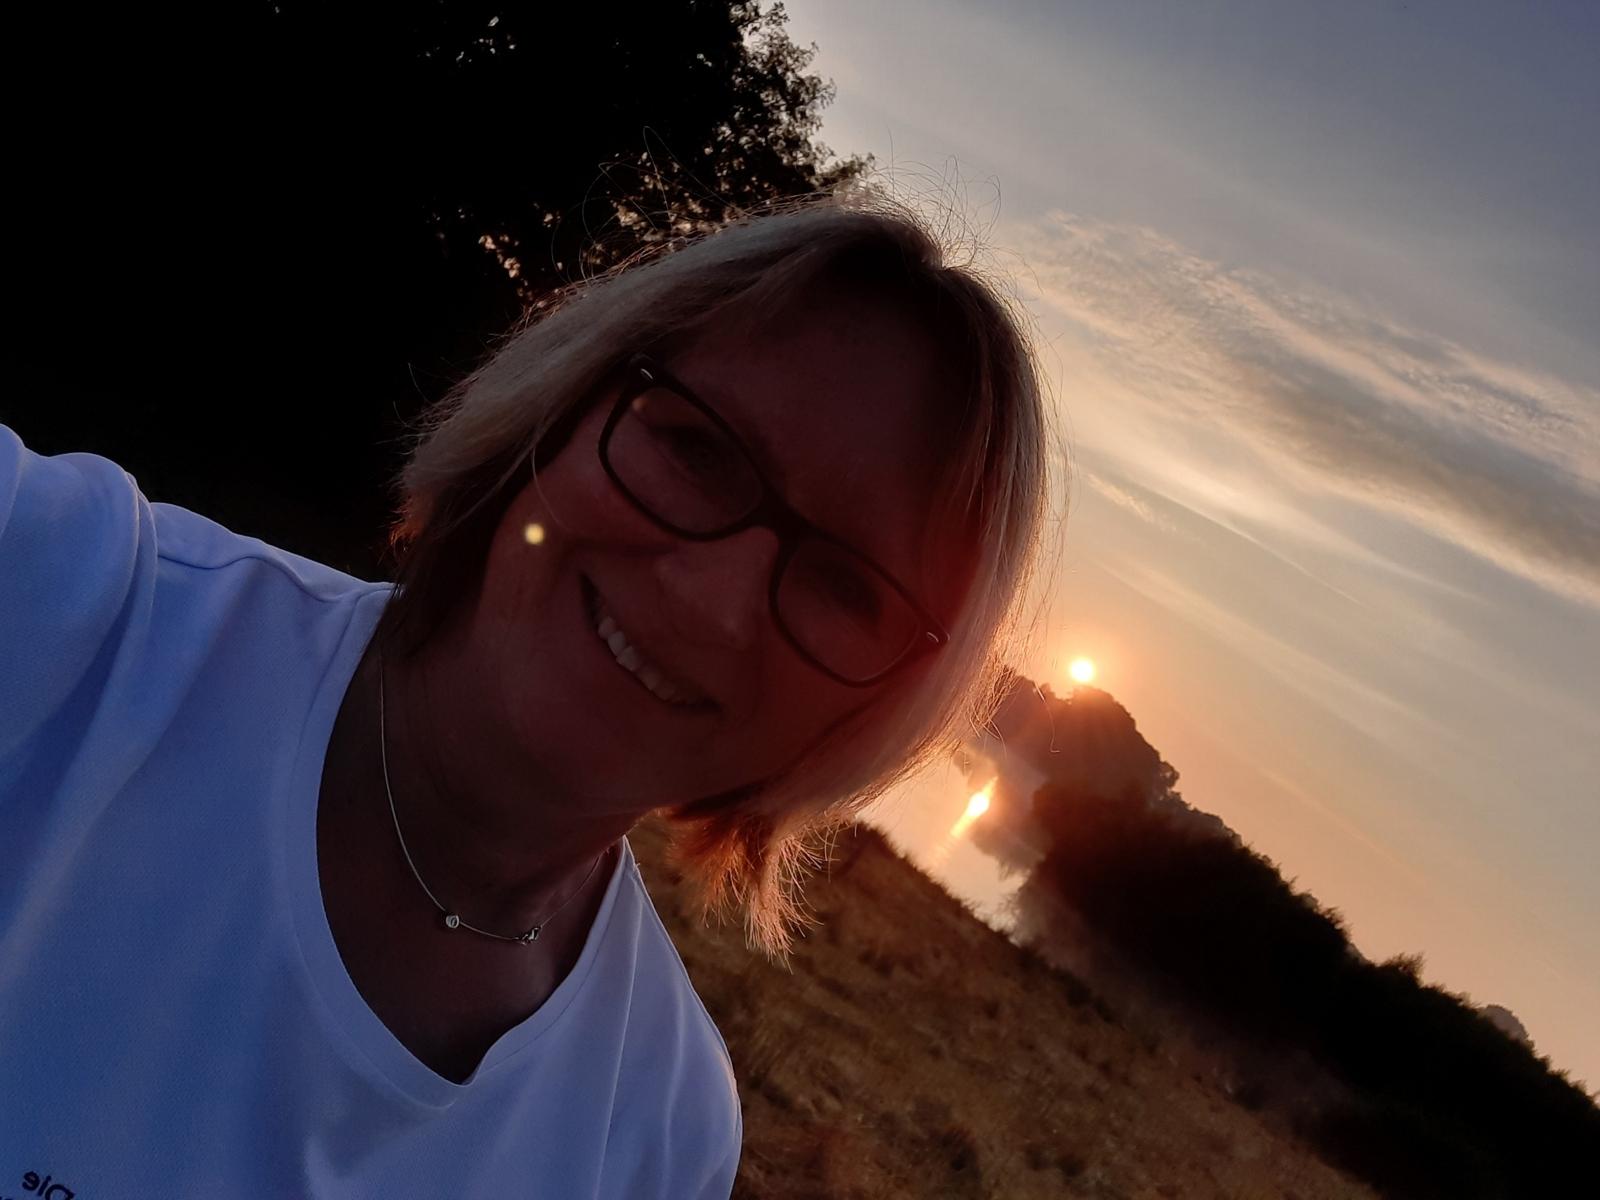 Stickling-Petra-23-Challenge-Sonnenaufgang-TTxPg